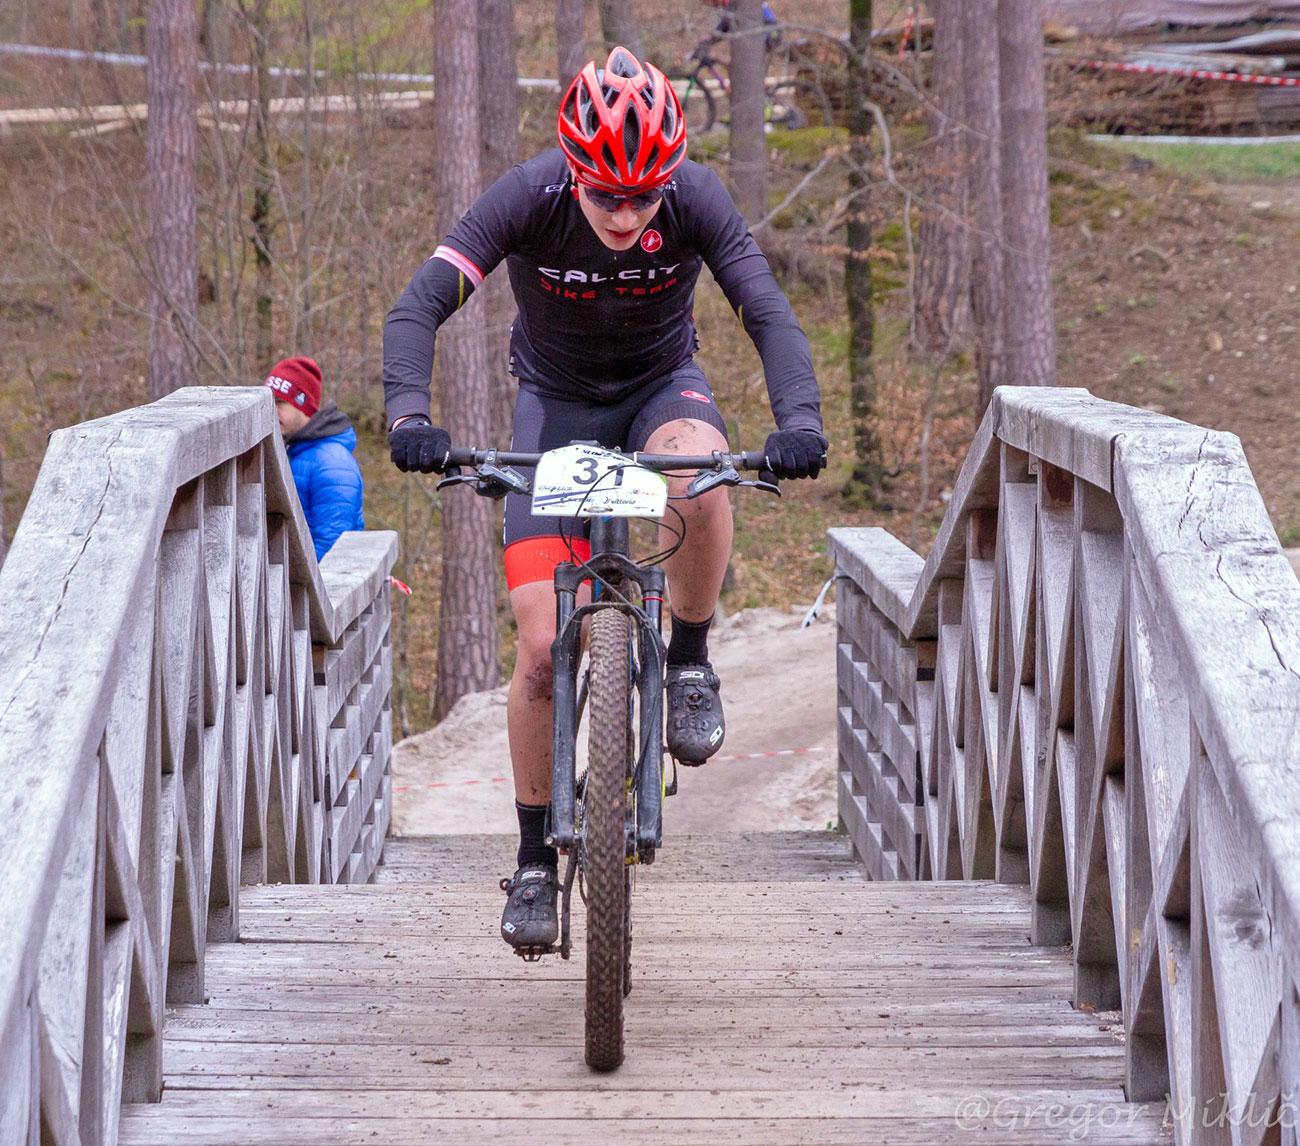 tilen jagodič, calcit bike team